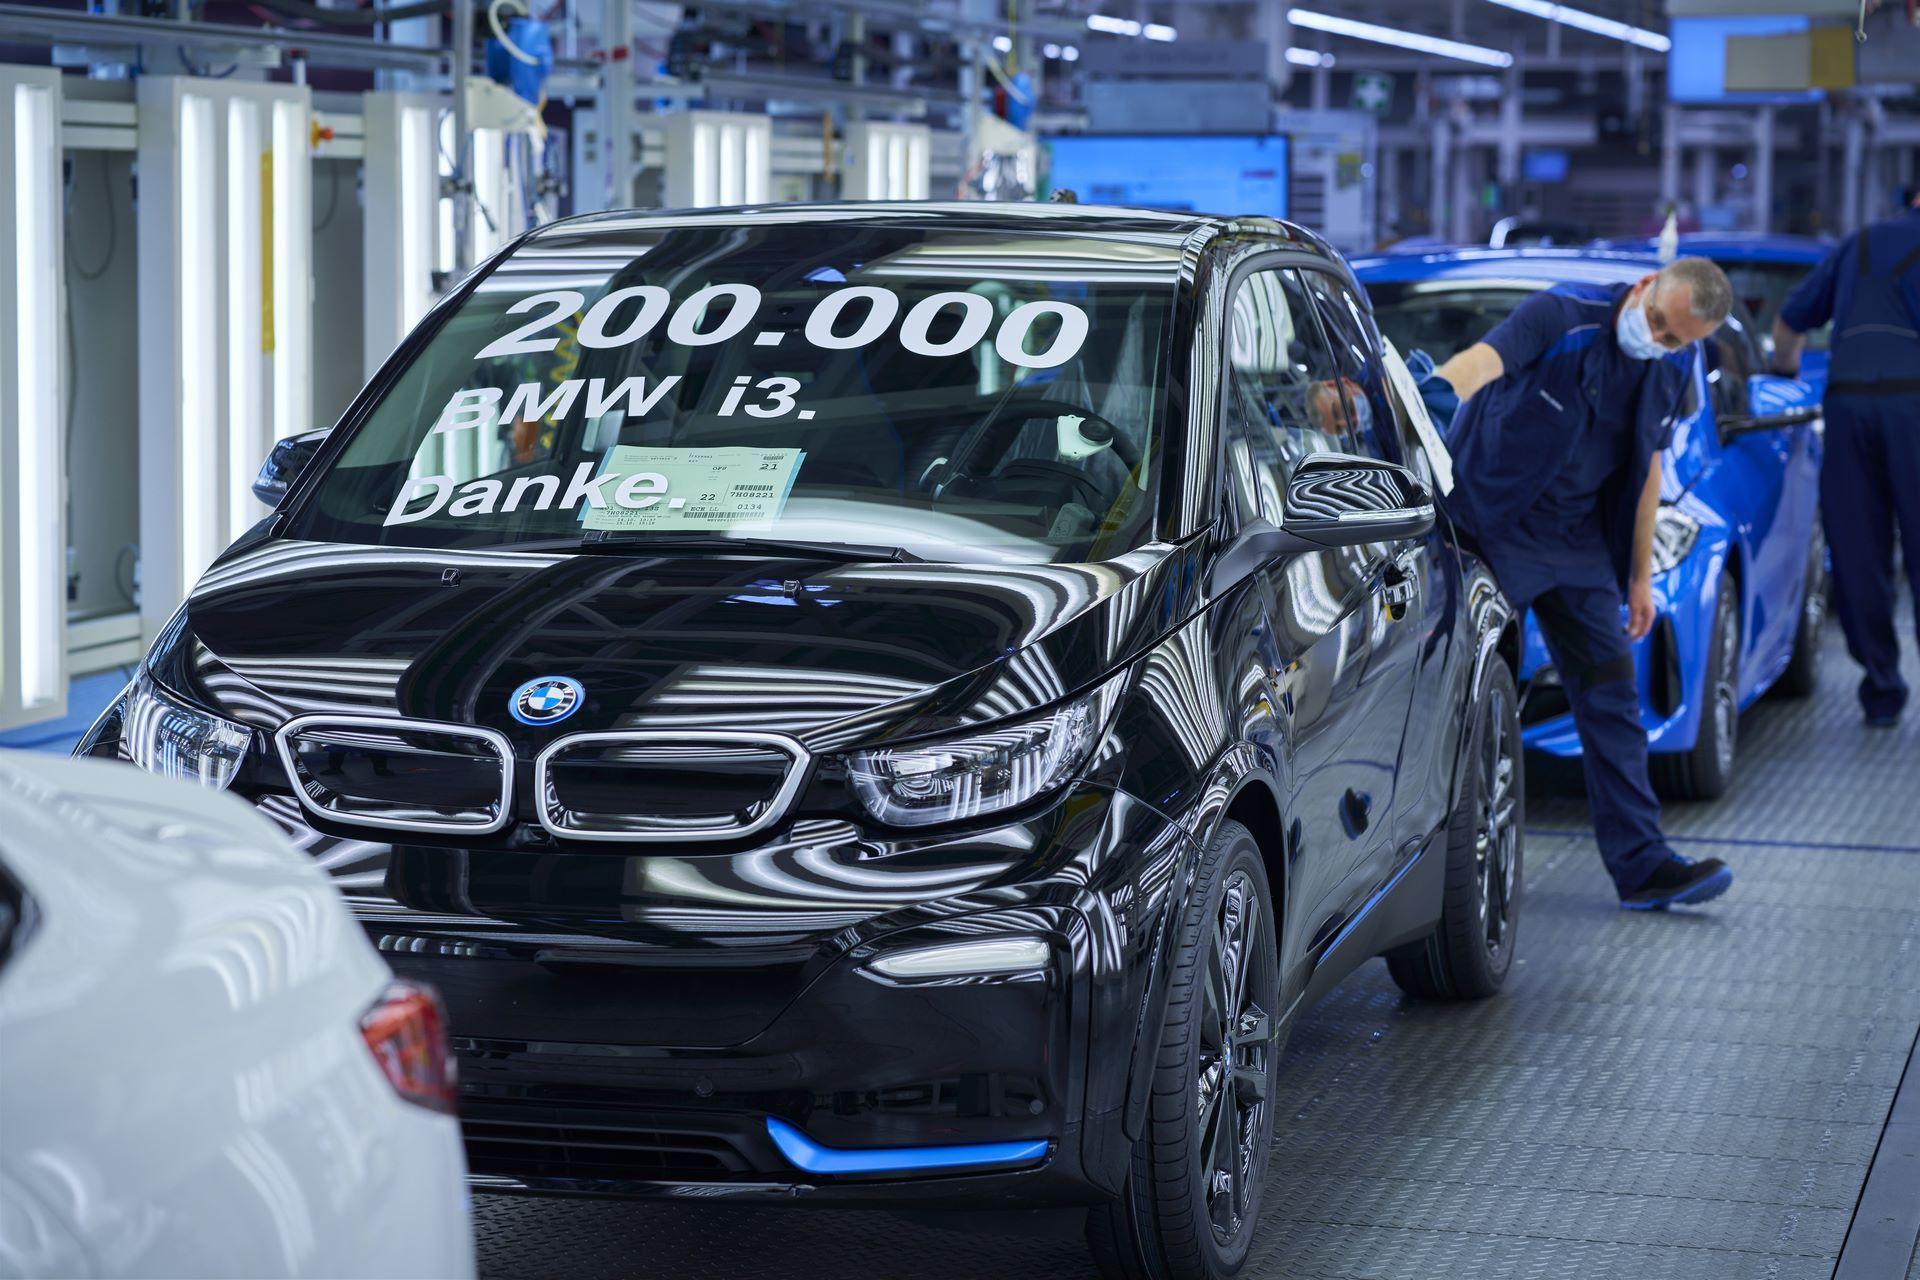 BMW-i8-plant-production-55